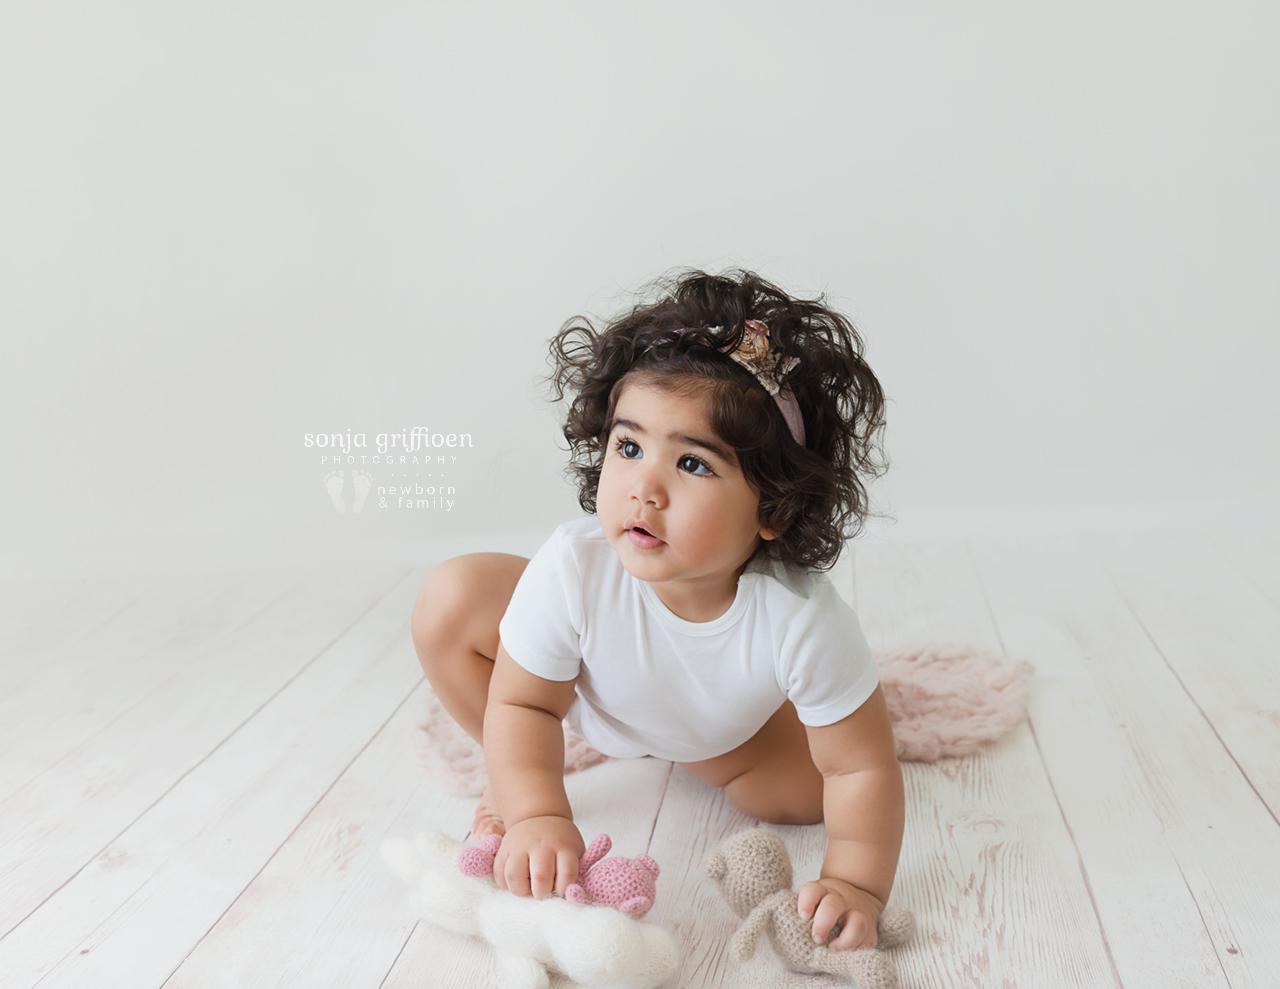 Yara-1-Brisbane-Baby-Photographer-Sonja-Griffioen-04.jpg